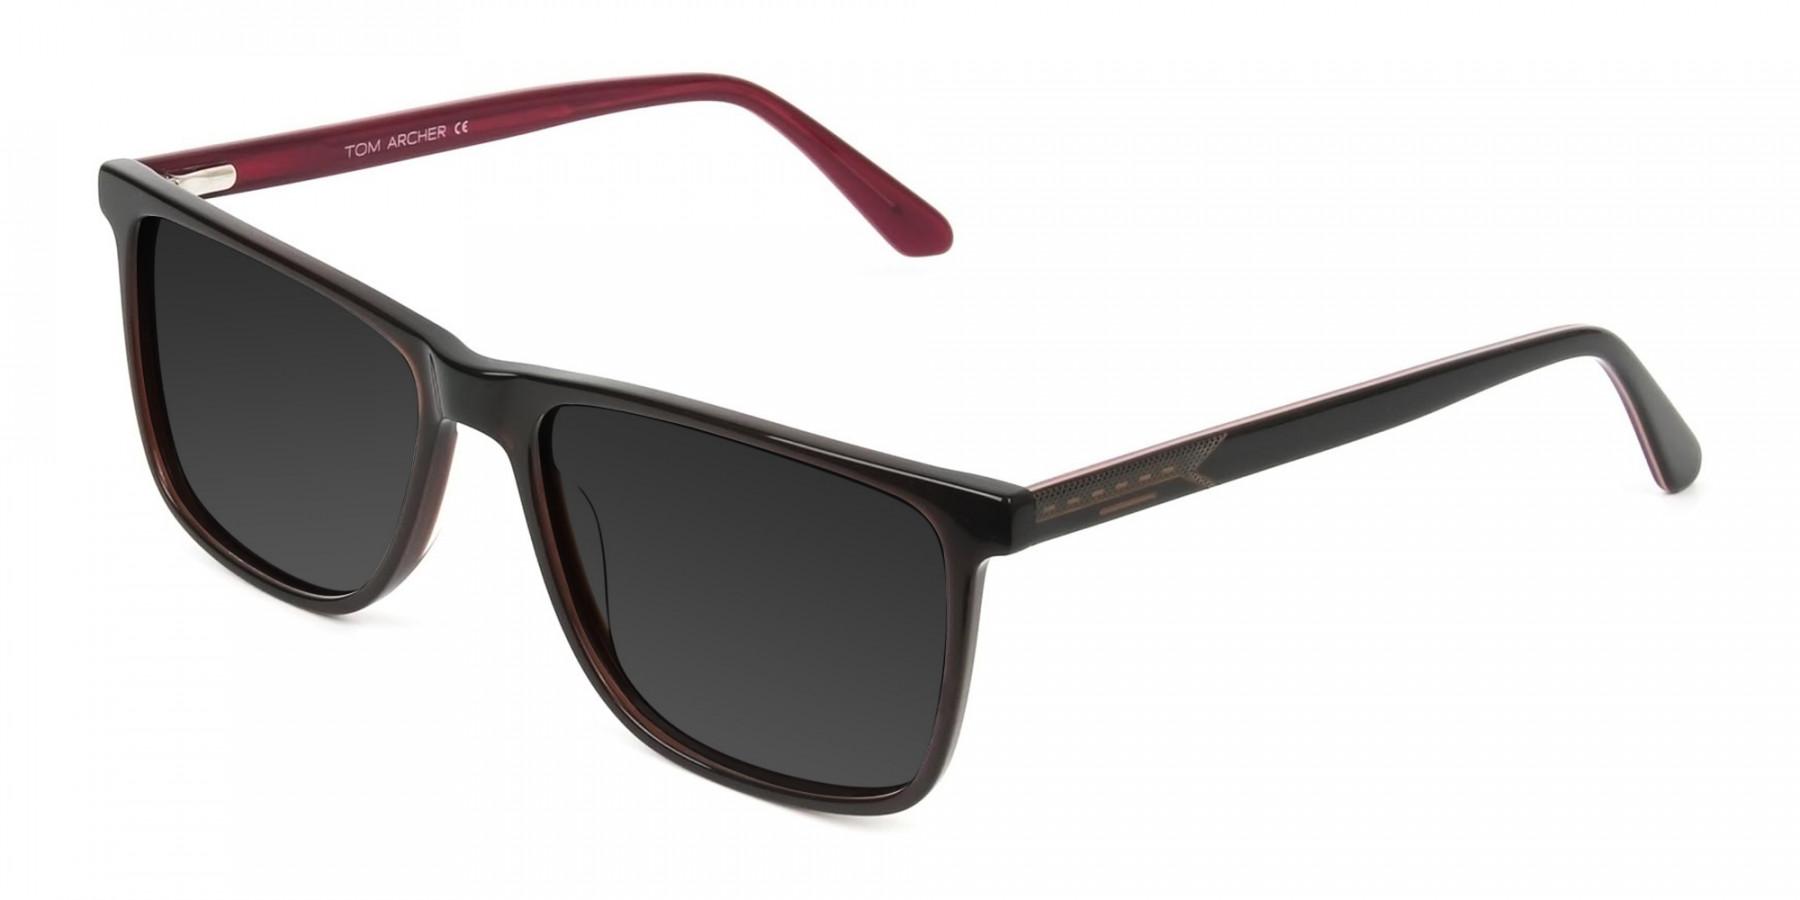 dark-brown-rectangular-full-rim-sunglasses-3